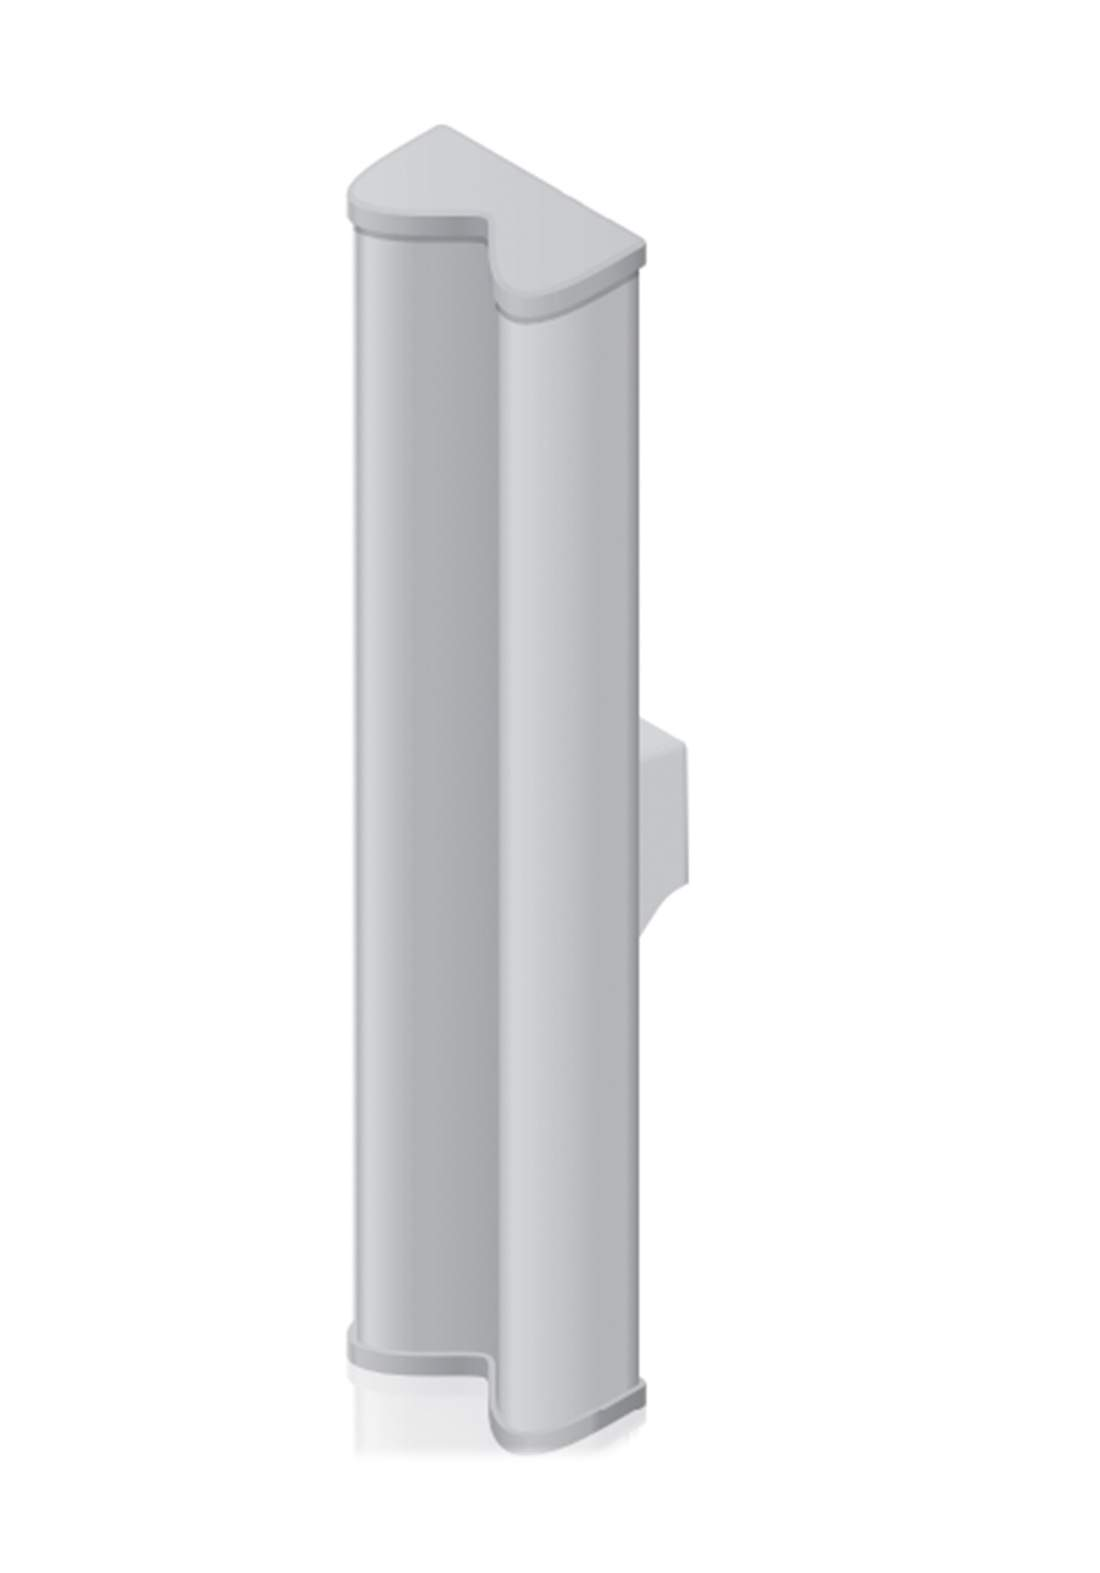 Ubiquiti AM-2G15-120 airMAX BaseStation Sector Antenna - White هوائي